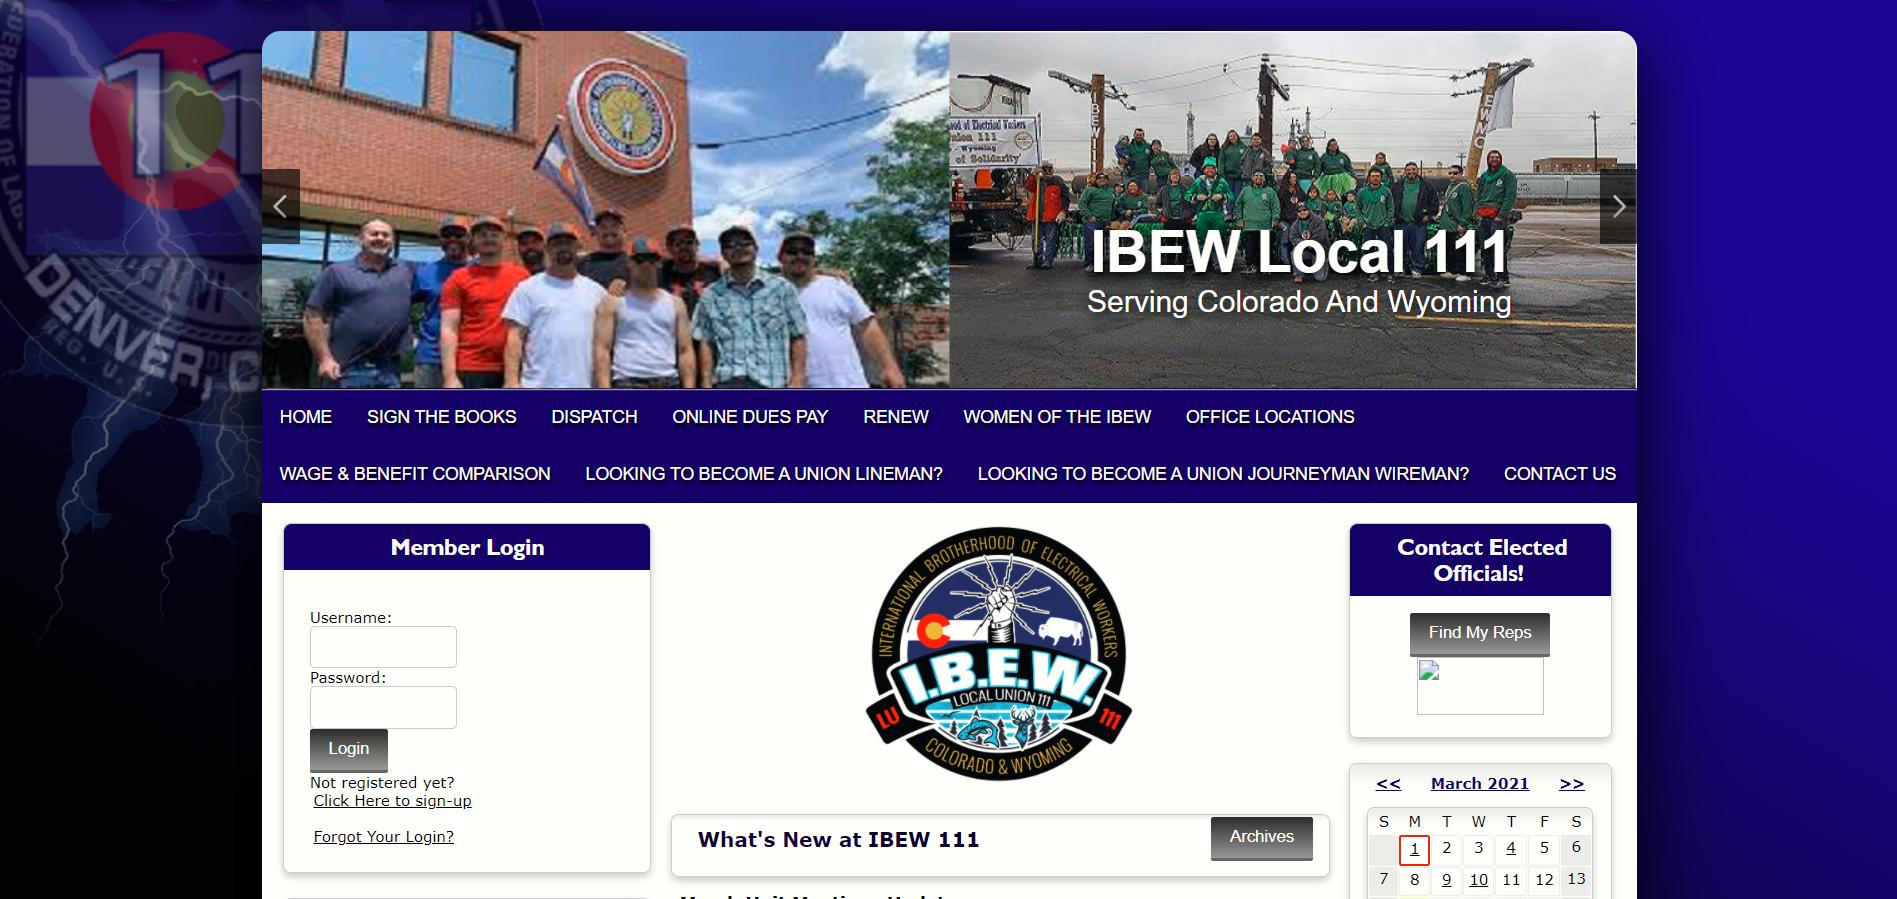 ibew local 111